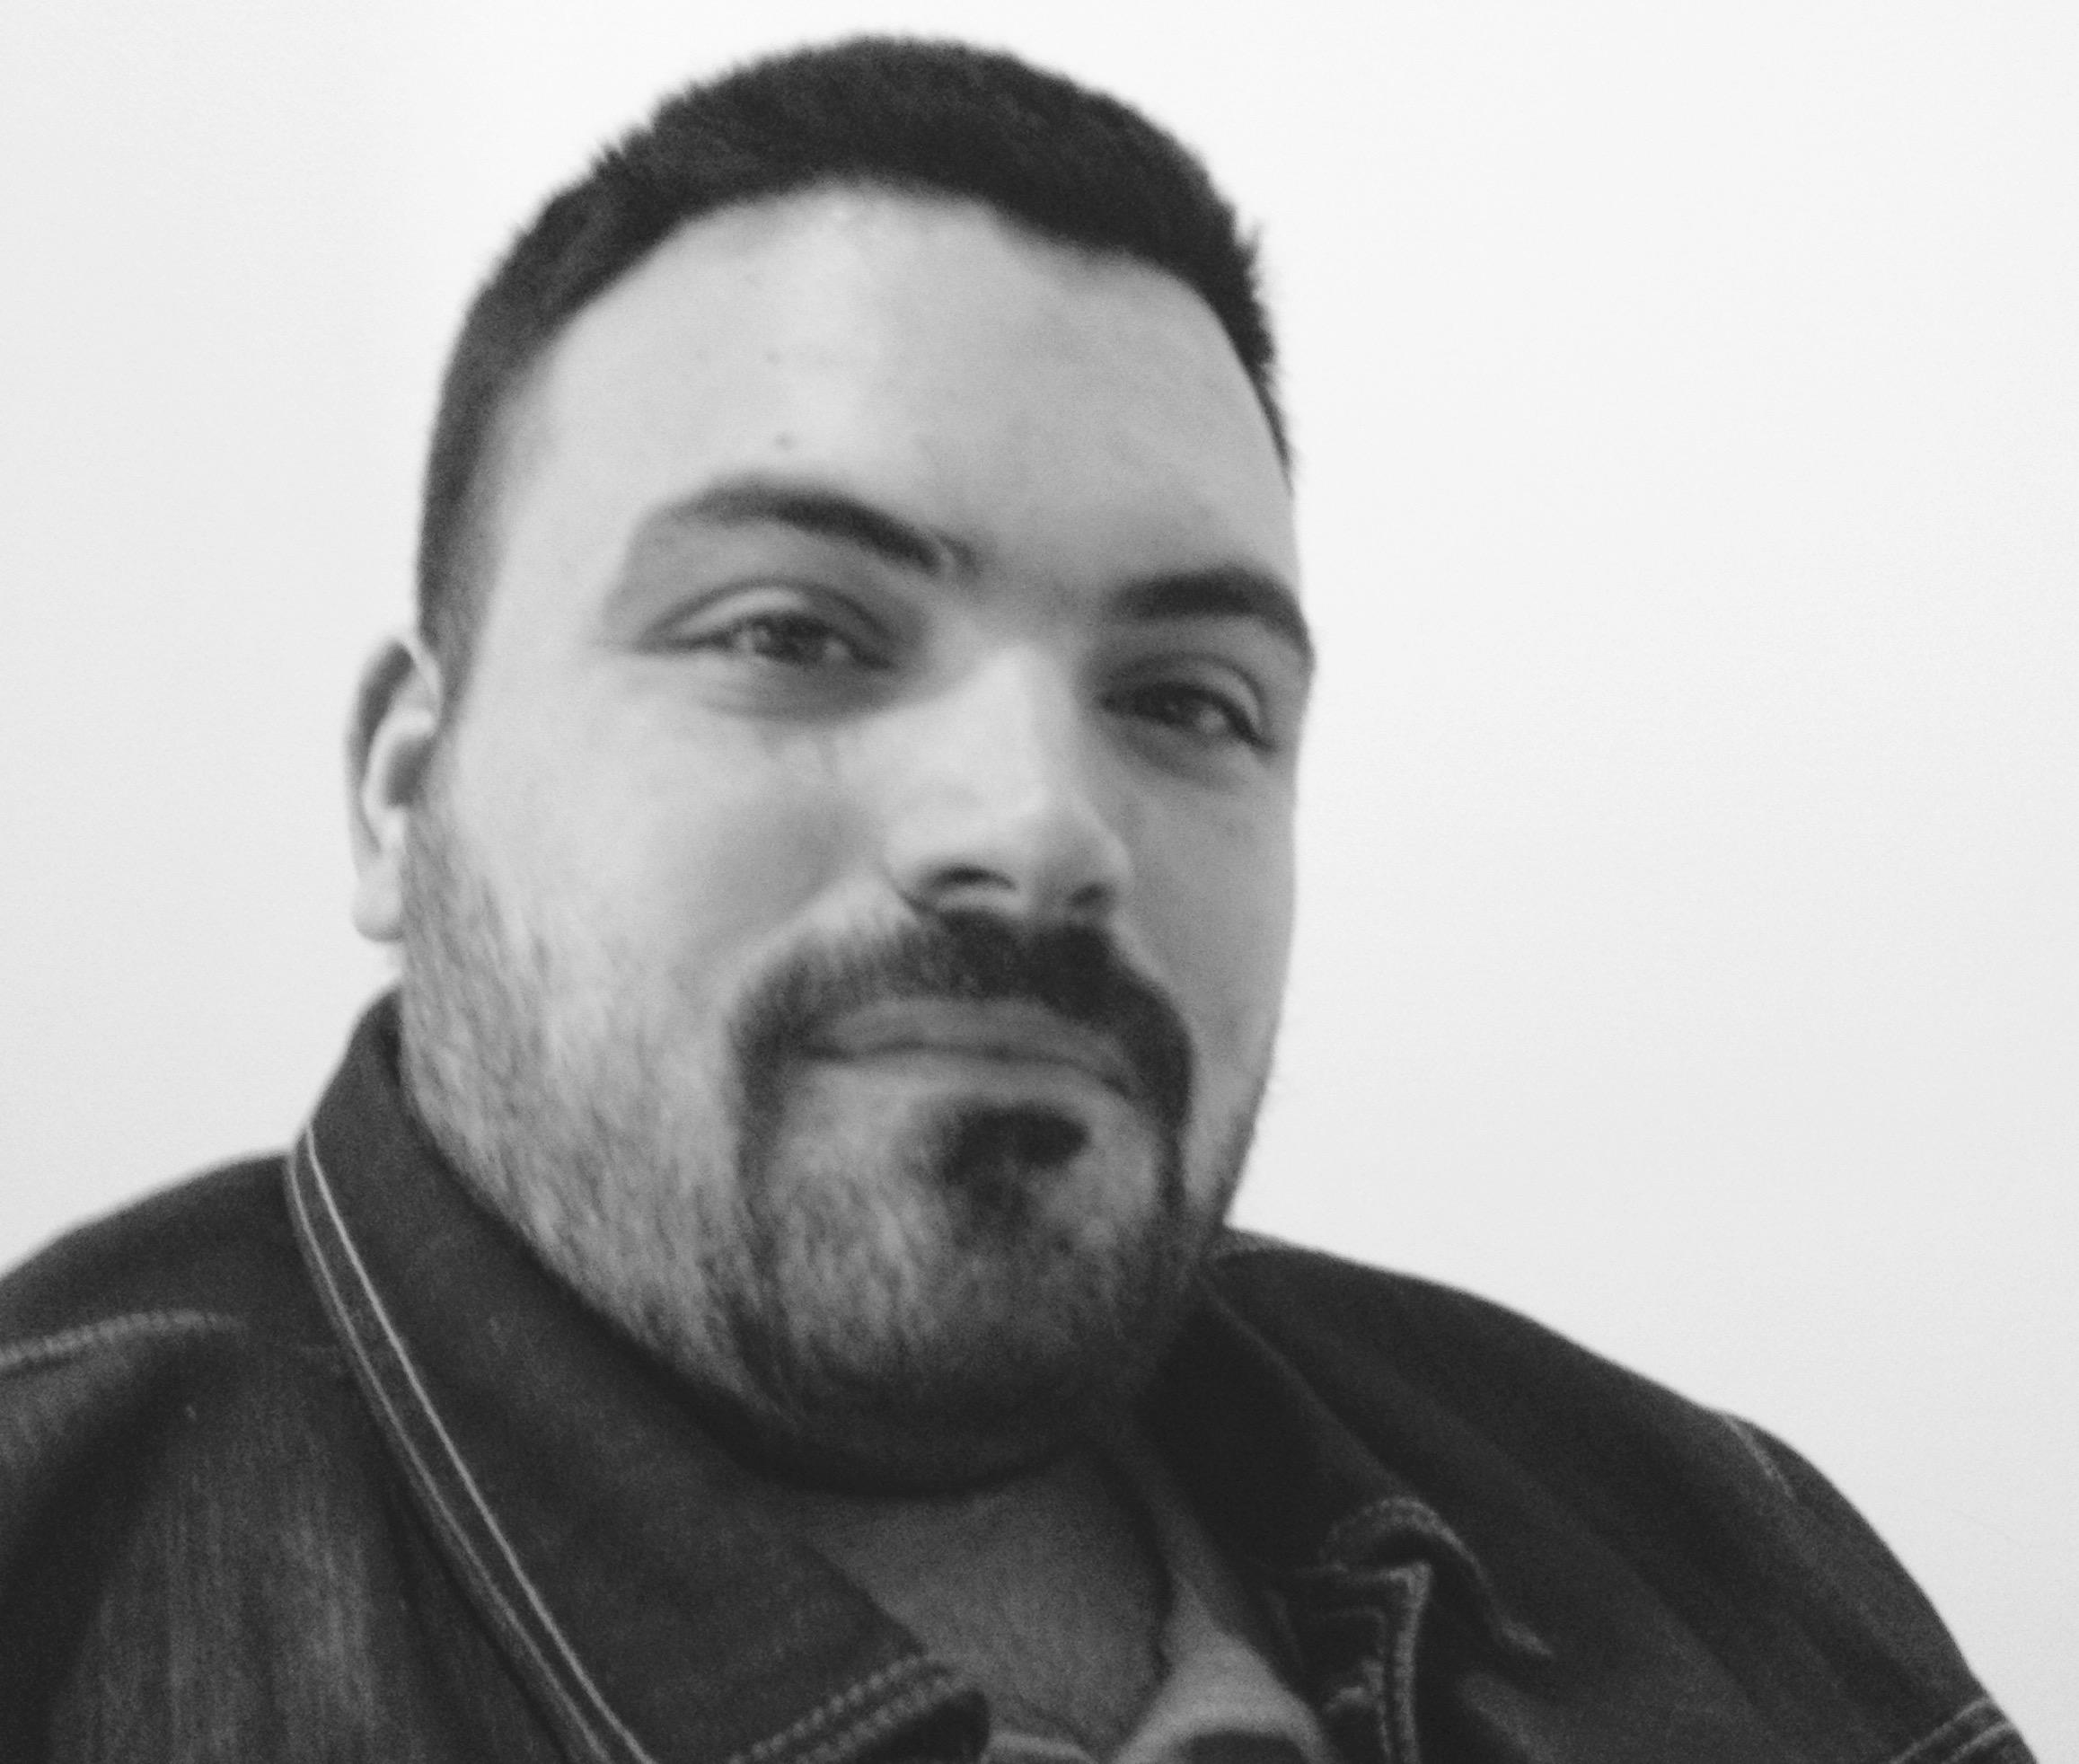 Quentin CORFA, fondateur de FranceVapor.com